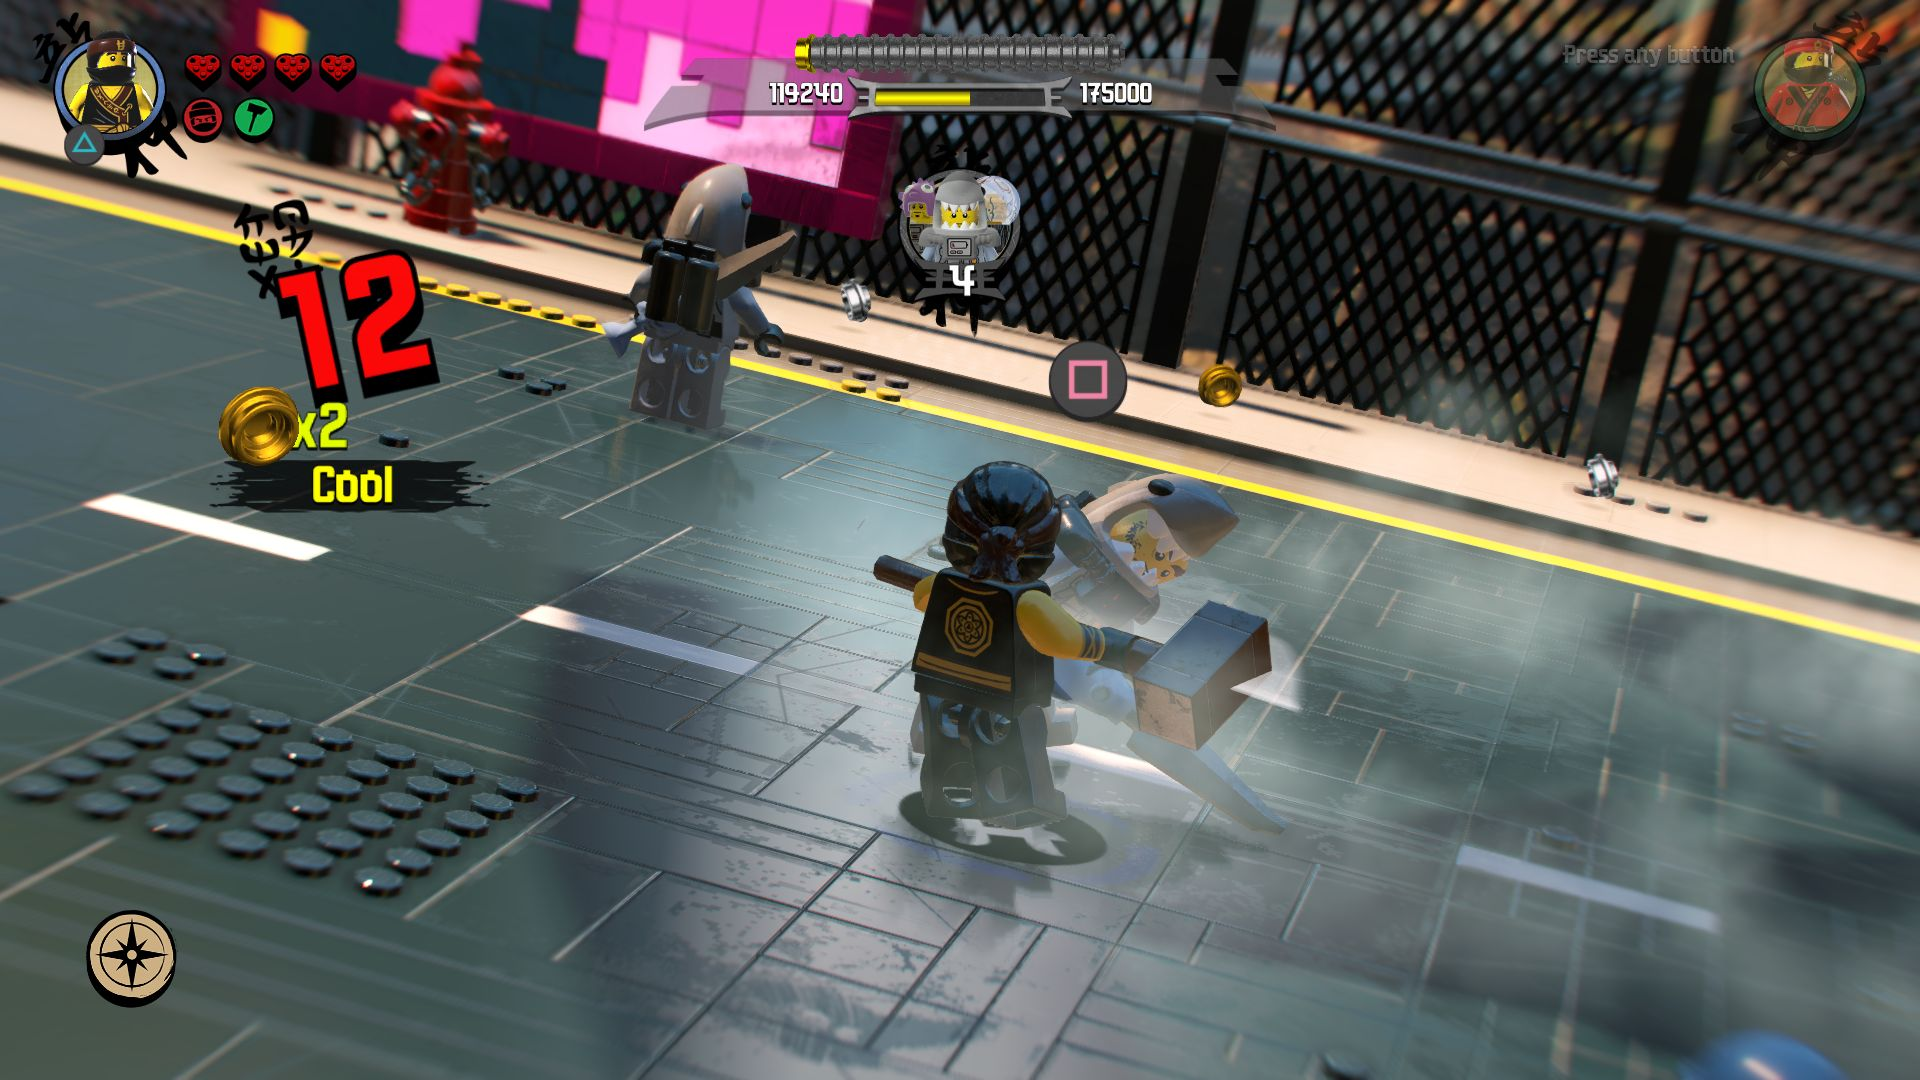 LEGO Ninjago Movie Video Game - jak se legáček nindžou stal 151111